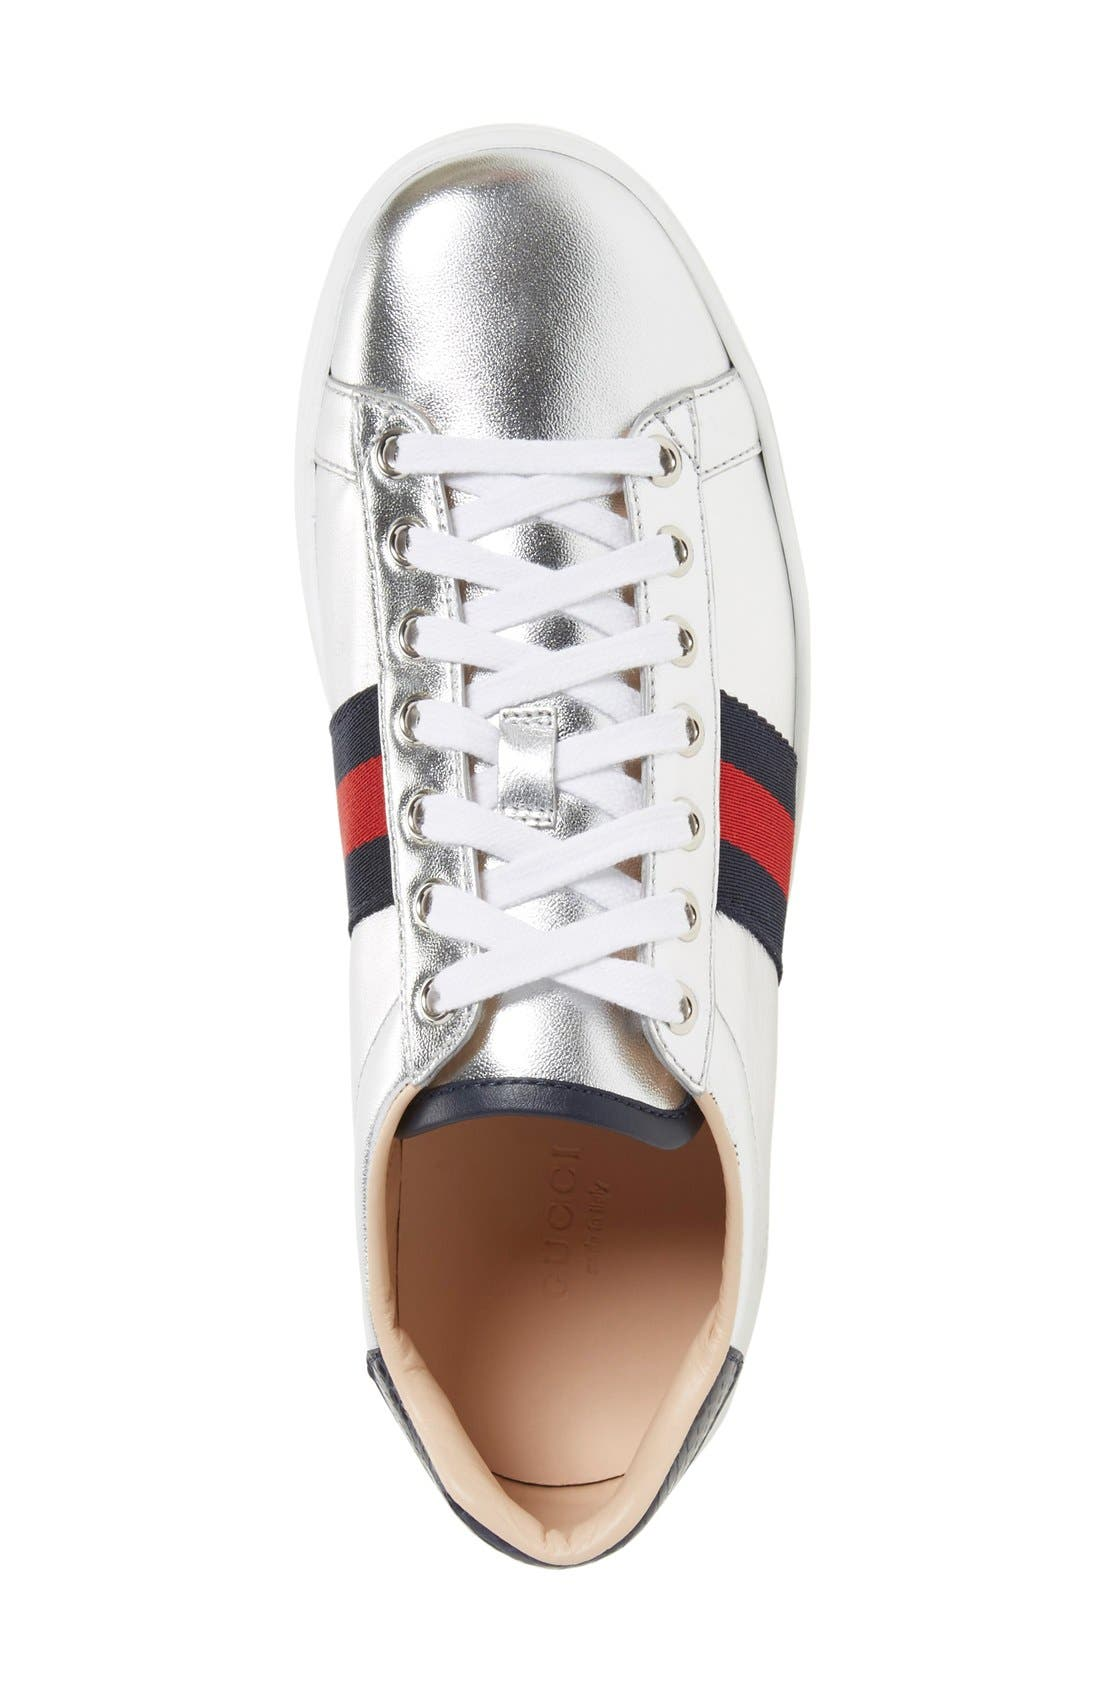 Alternate Image 3  - Gucci 'New Ace' Metallic Low Top Sneaker (Women)